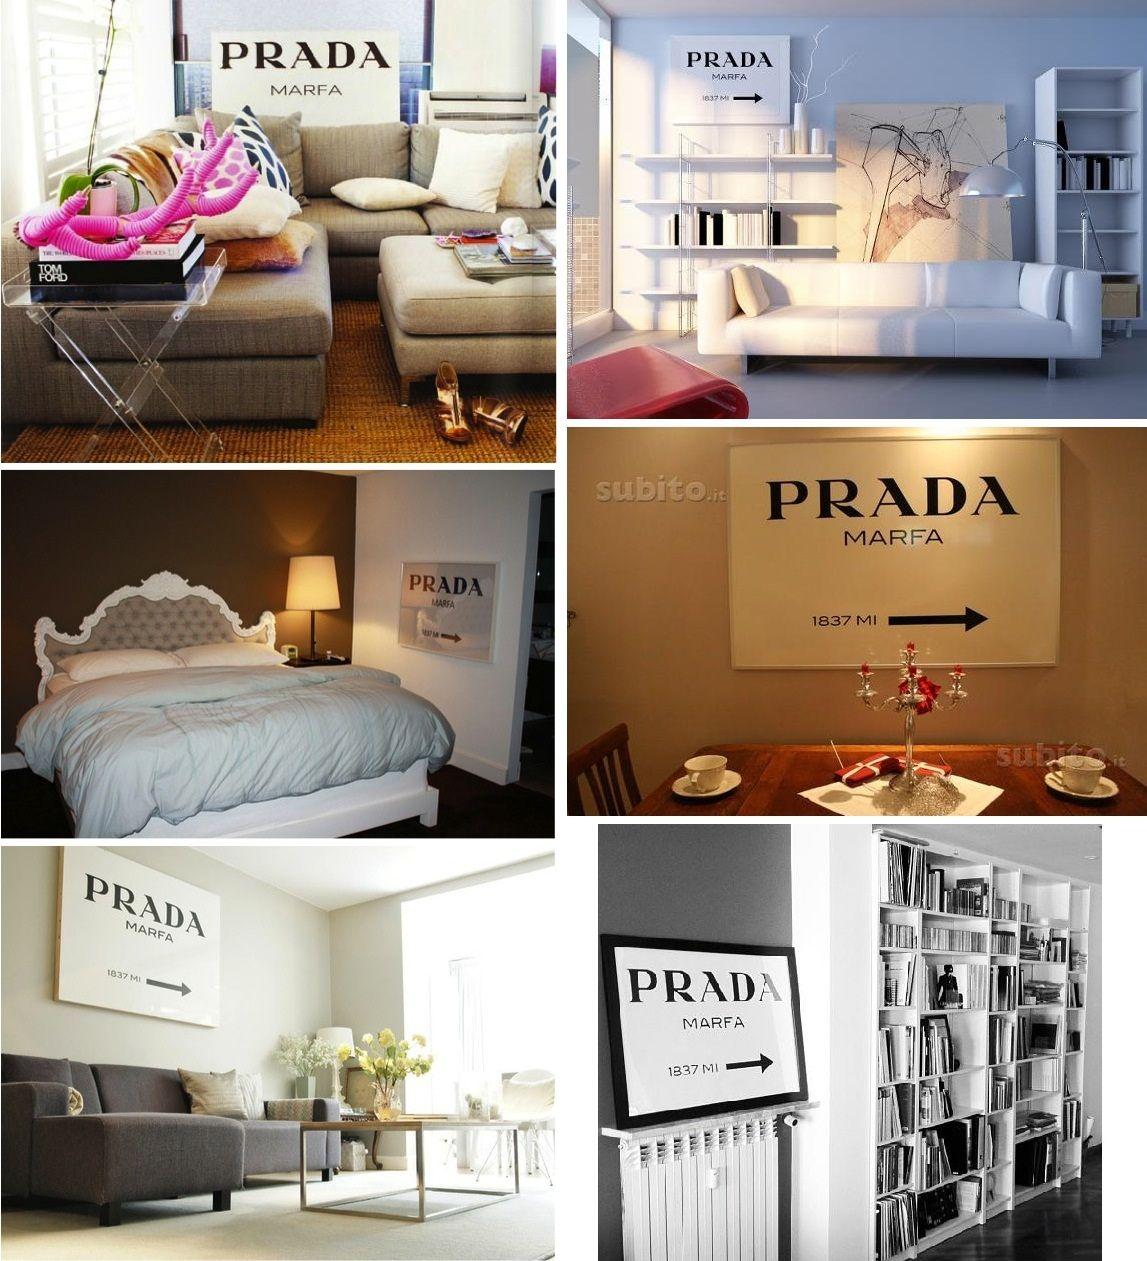 quadros prada marfa sign | THE HOUSE | Pinterest | Prada marfa ...